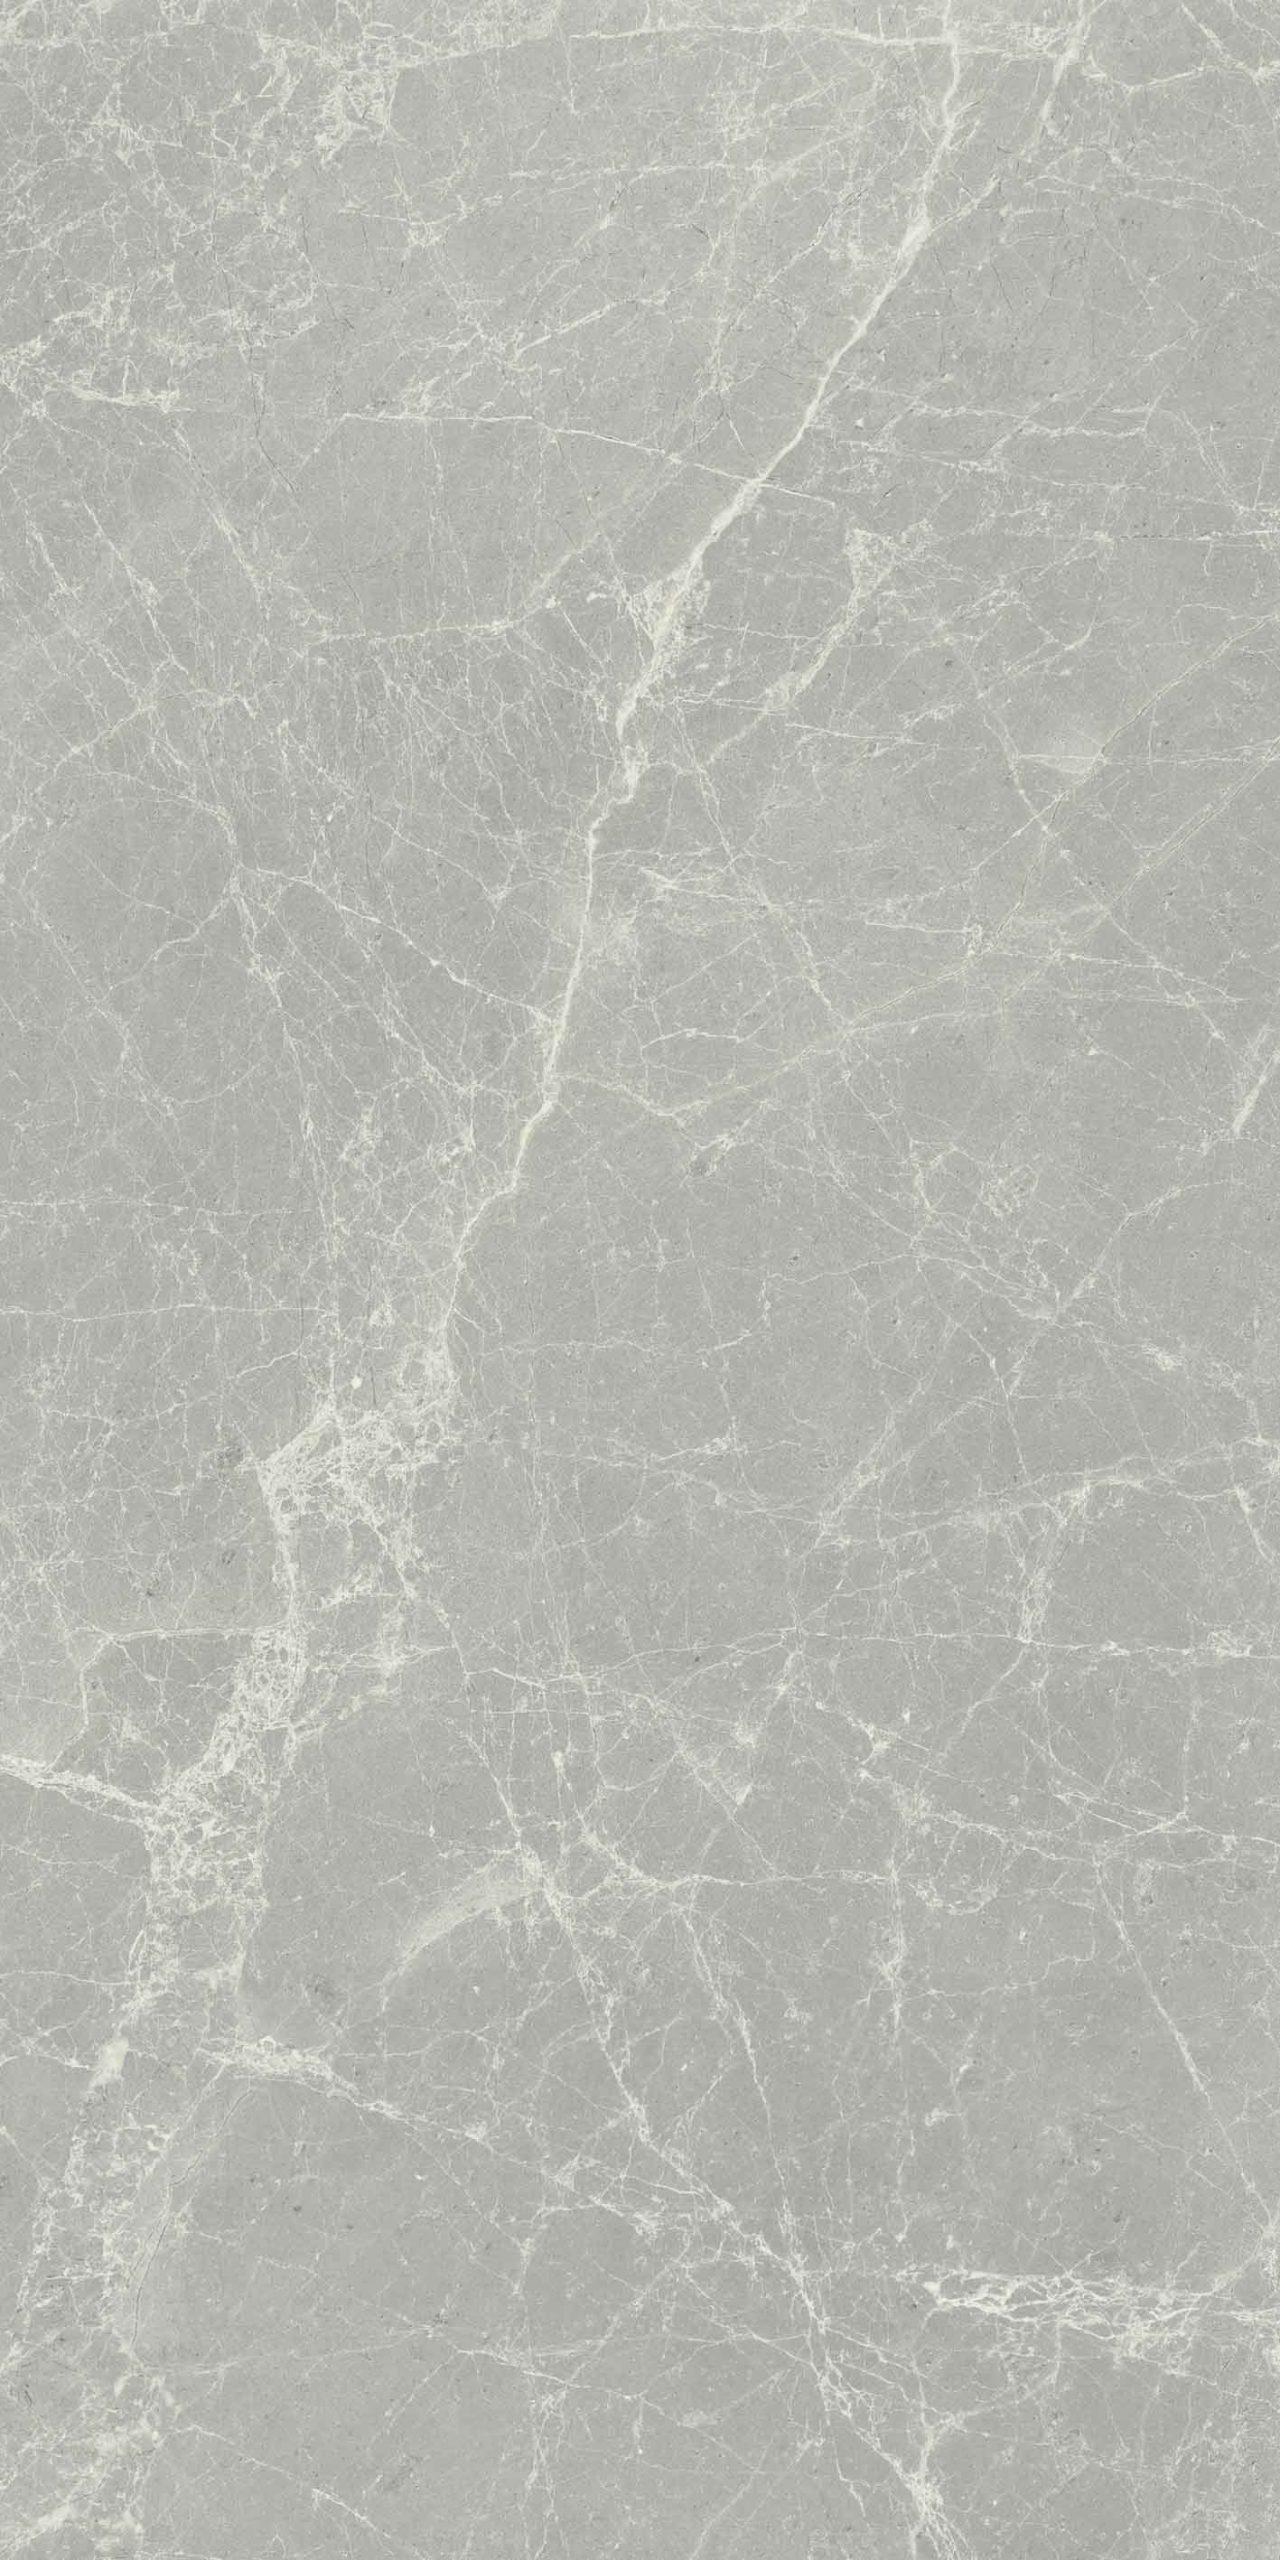 Exalt of Cerim Silver Light Glossy 10mm 60 x 120